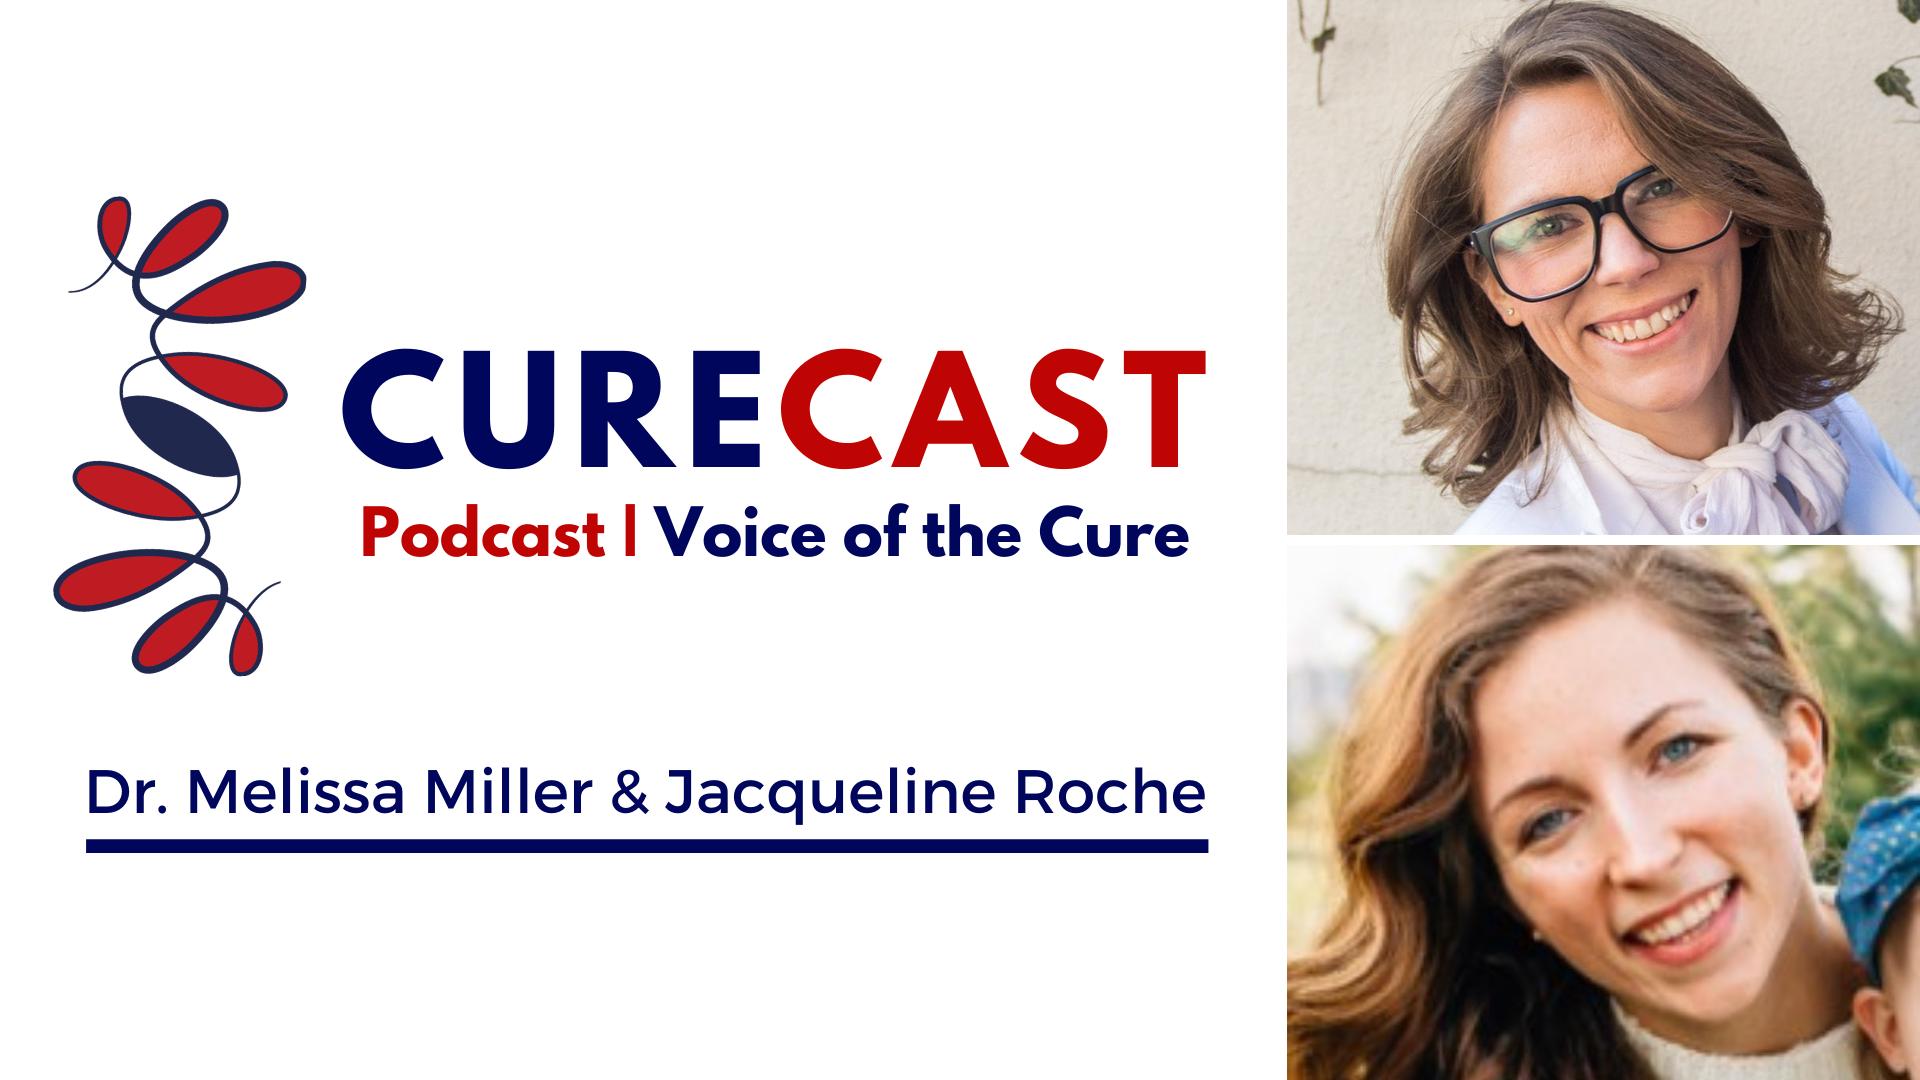 CureCast Episode 49: Dr. Melissa Miller and Jacqueline Roche